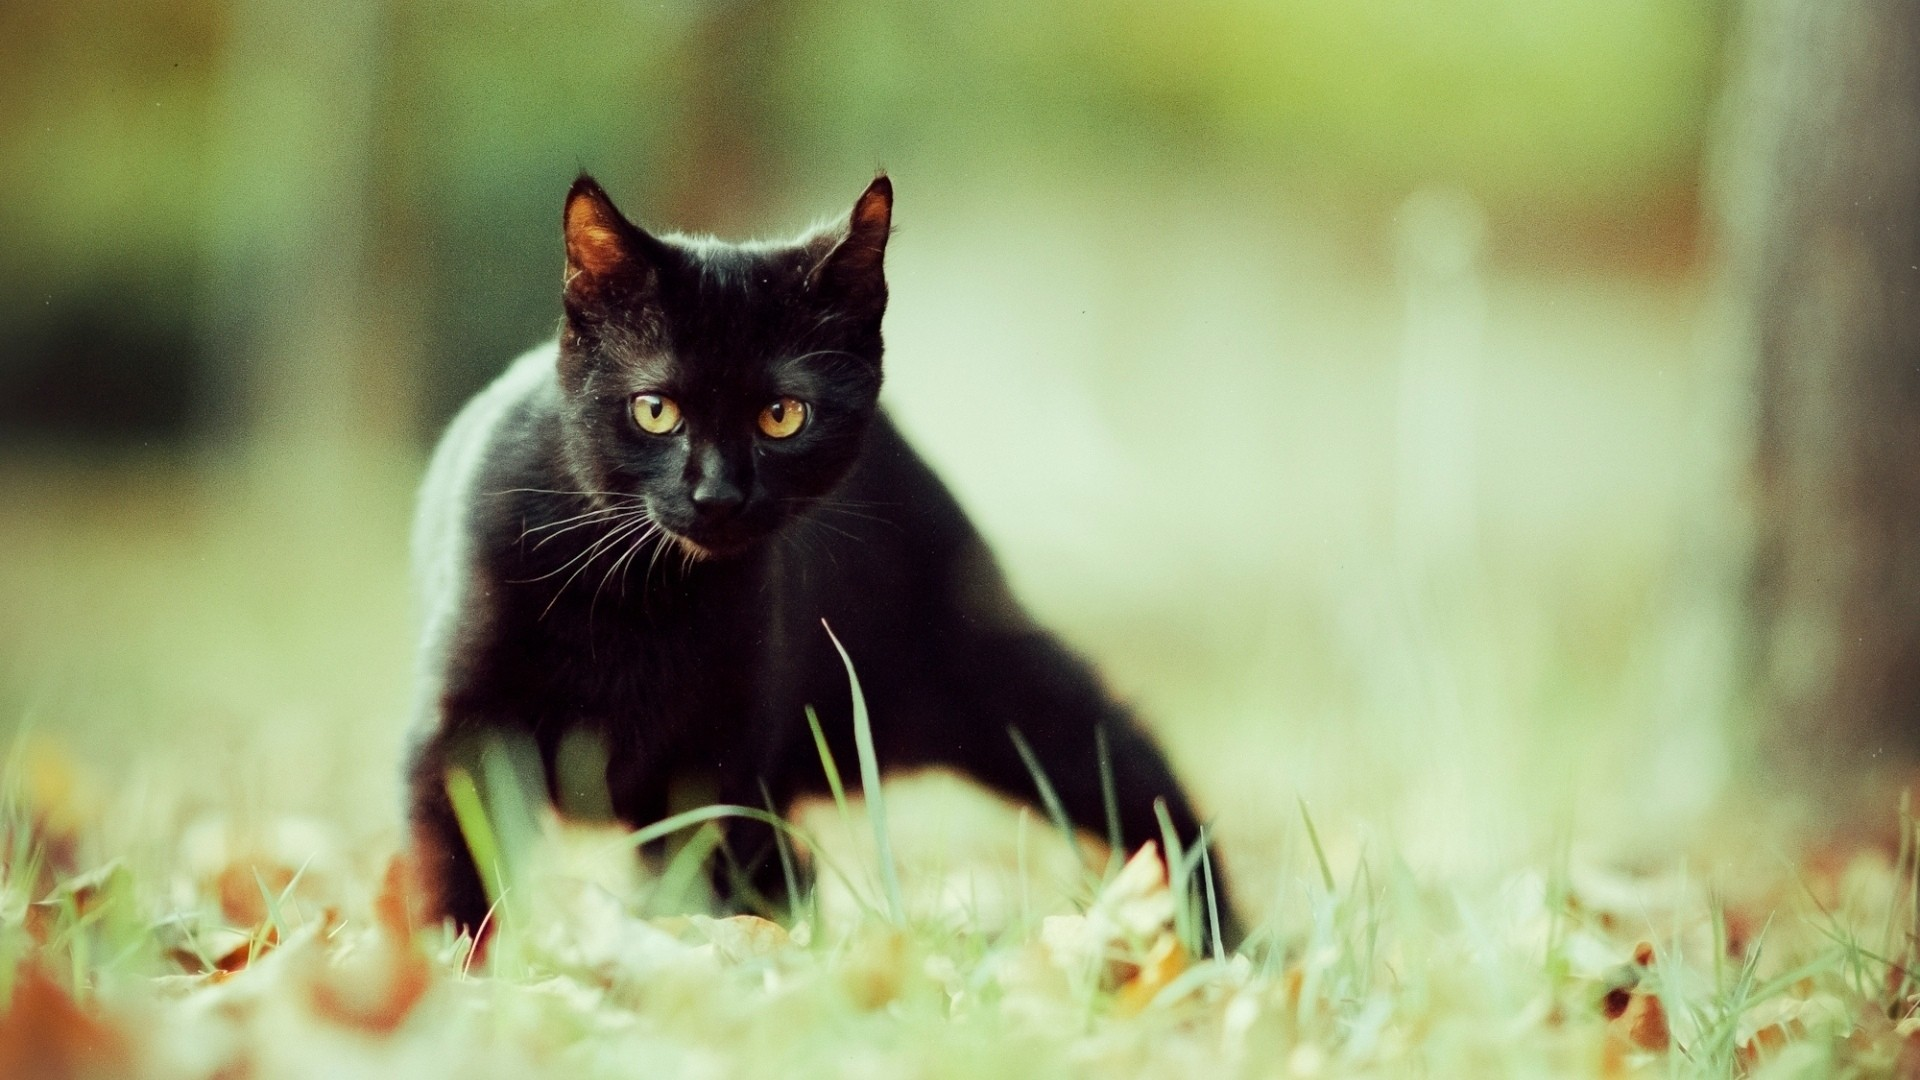 Black Cat Wallpaper image hd